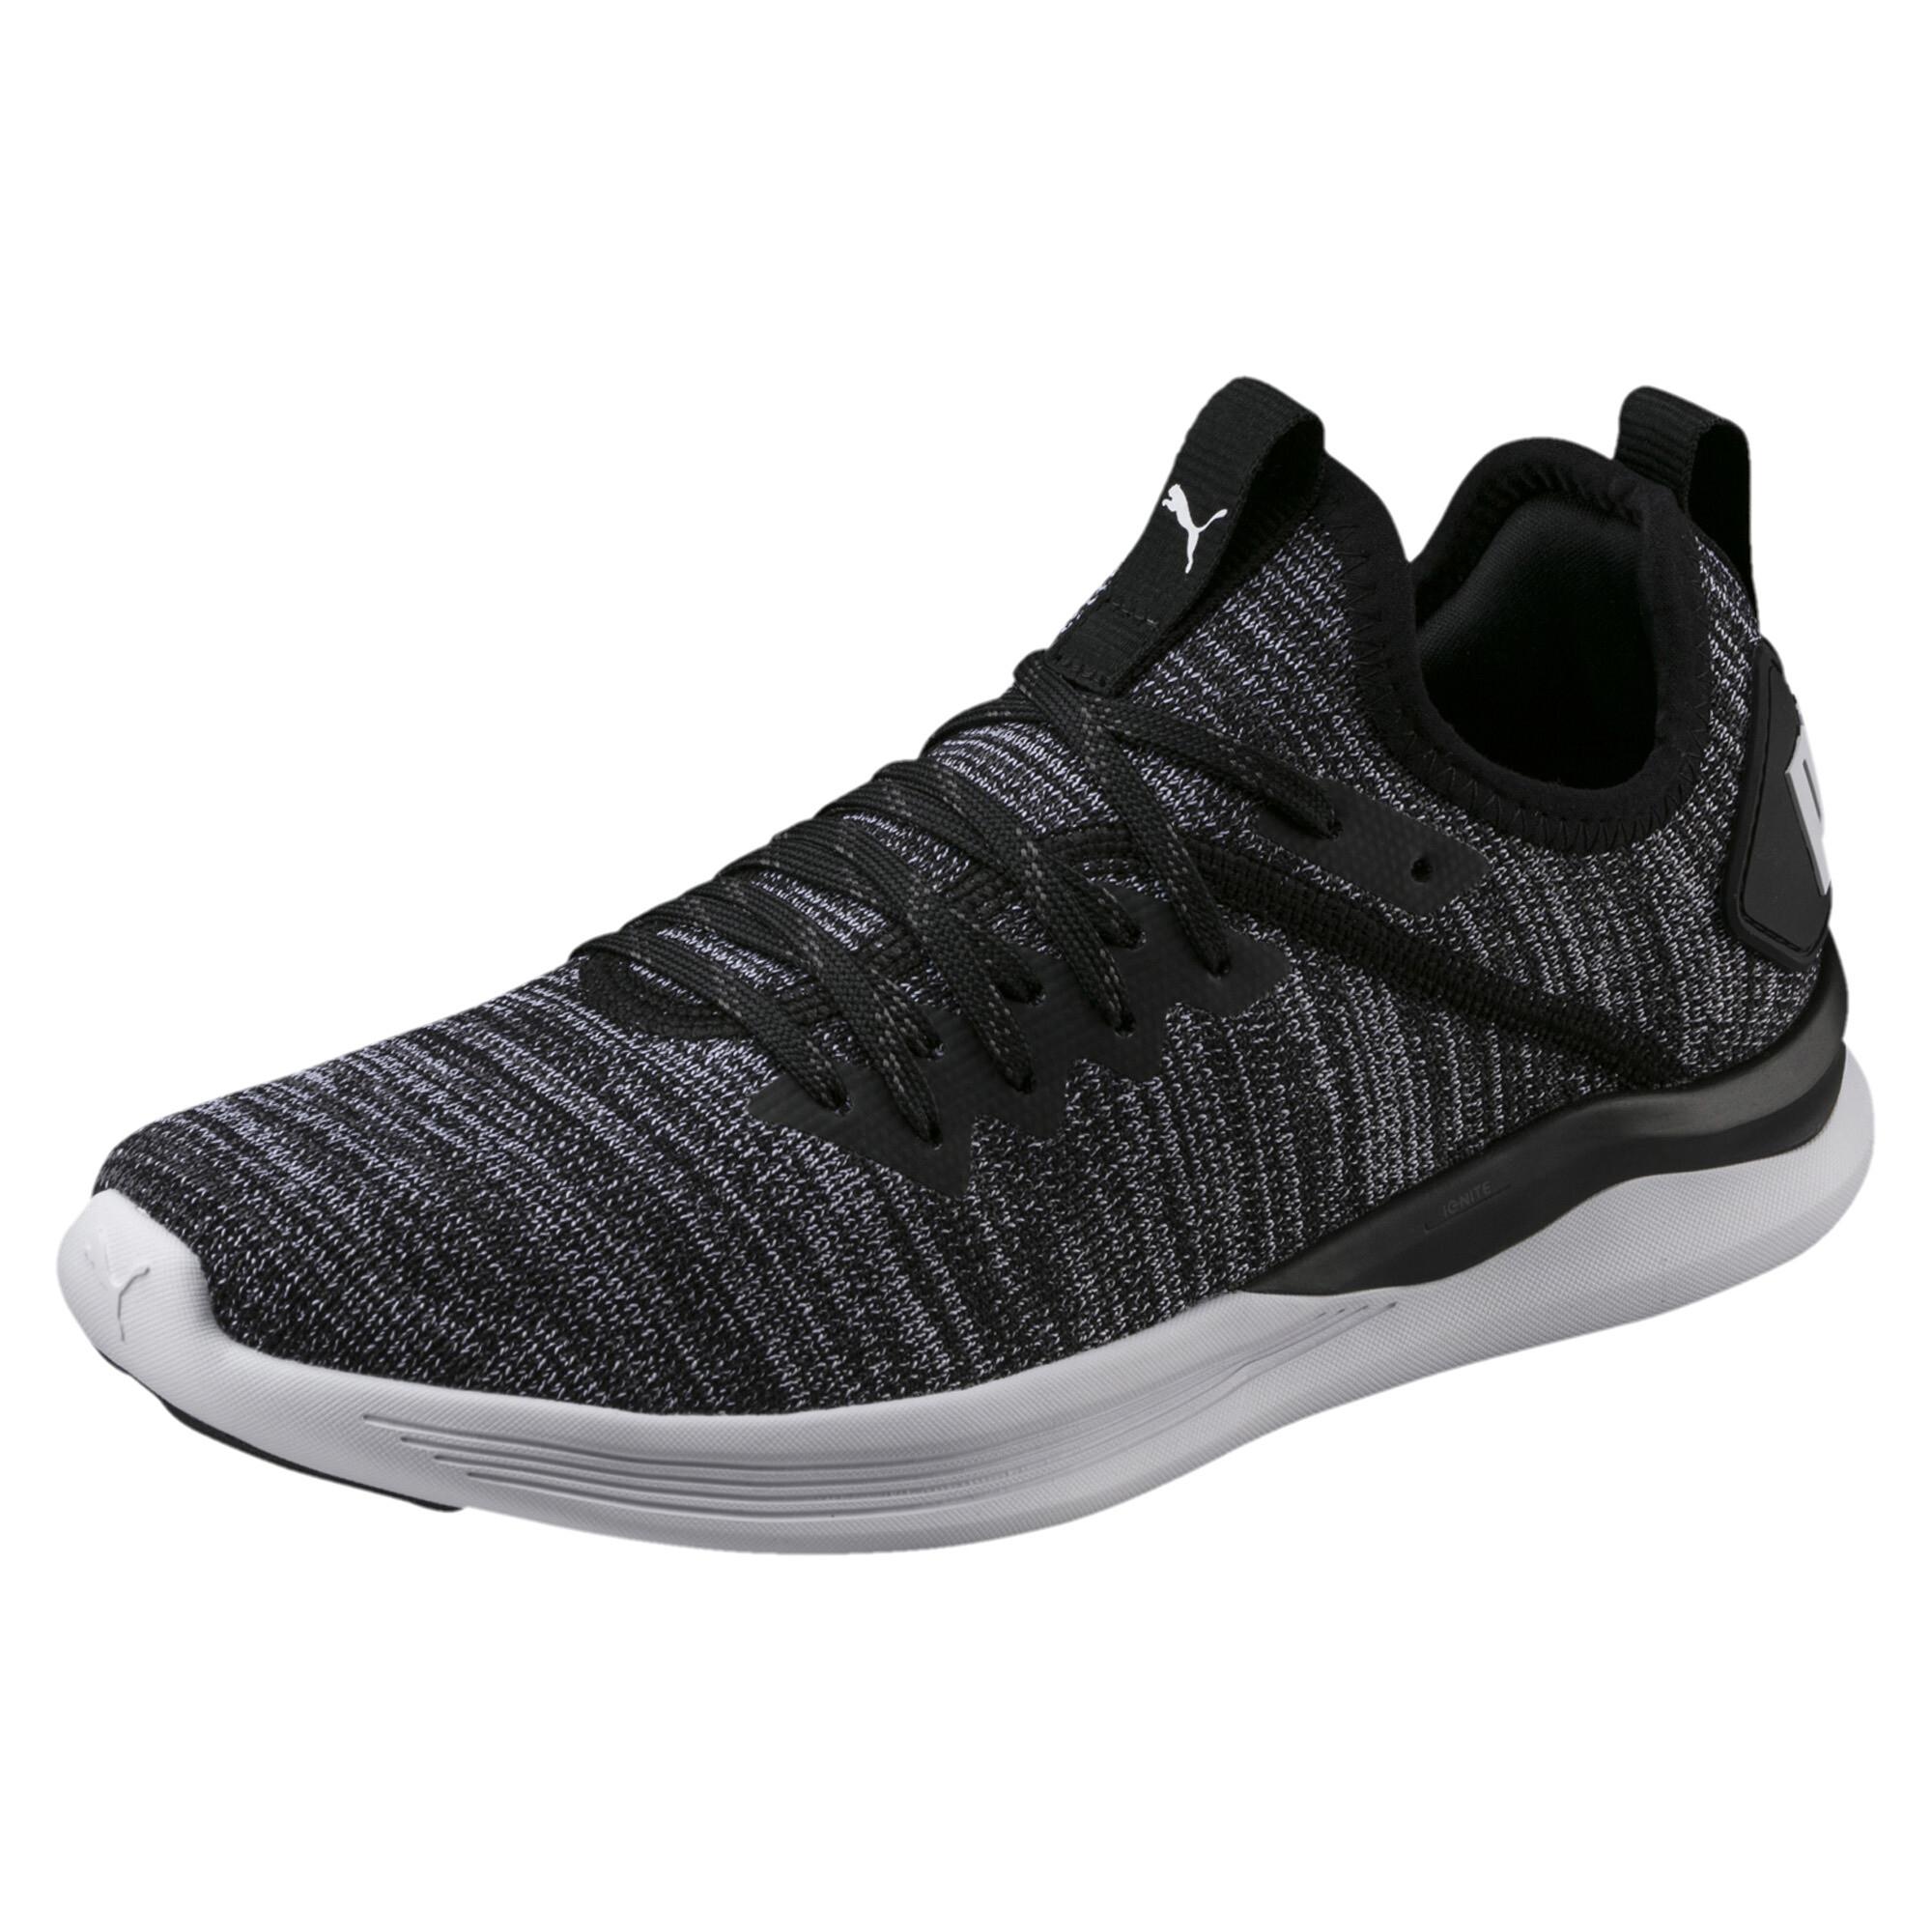 Image Puma IGNITE Flash evoKNIT Women's Running Shoes #1